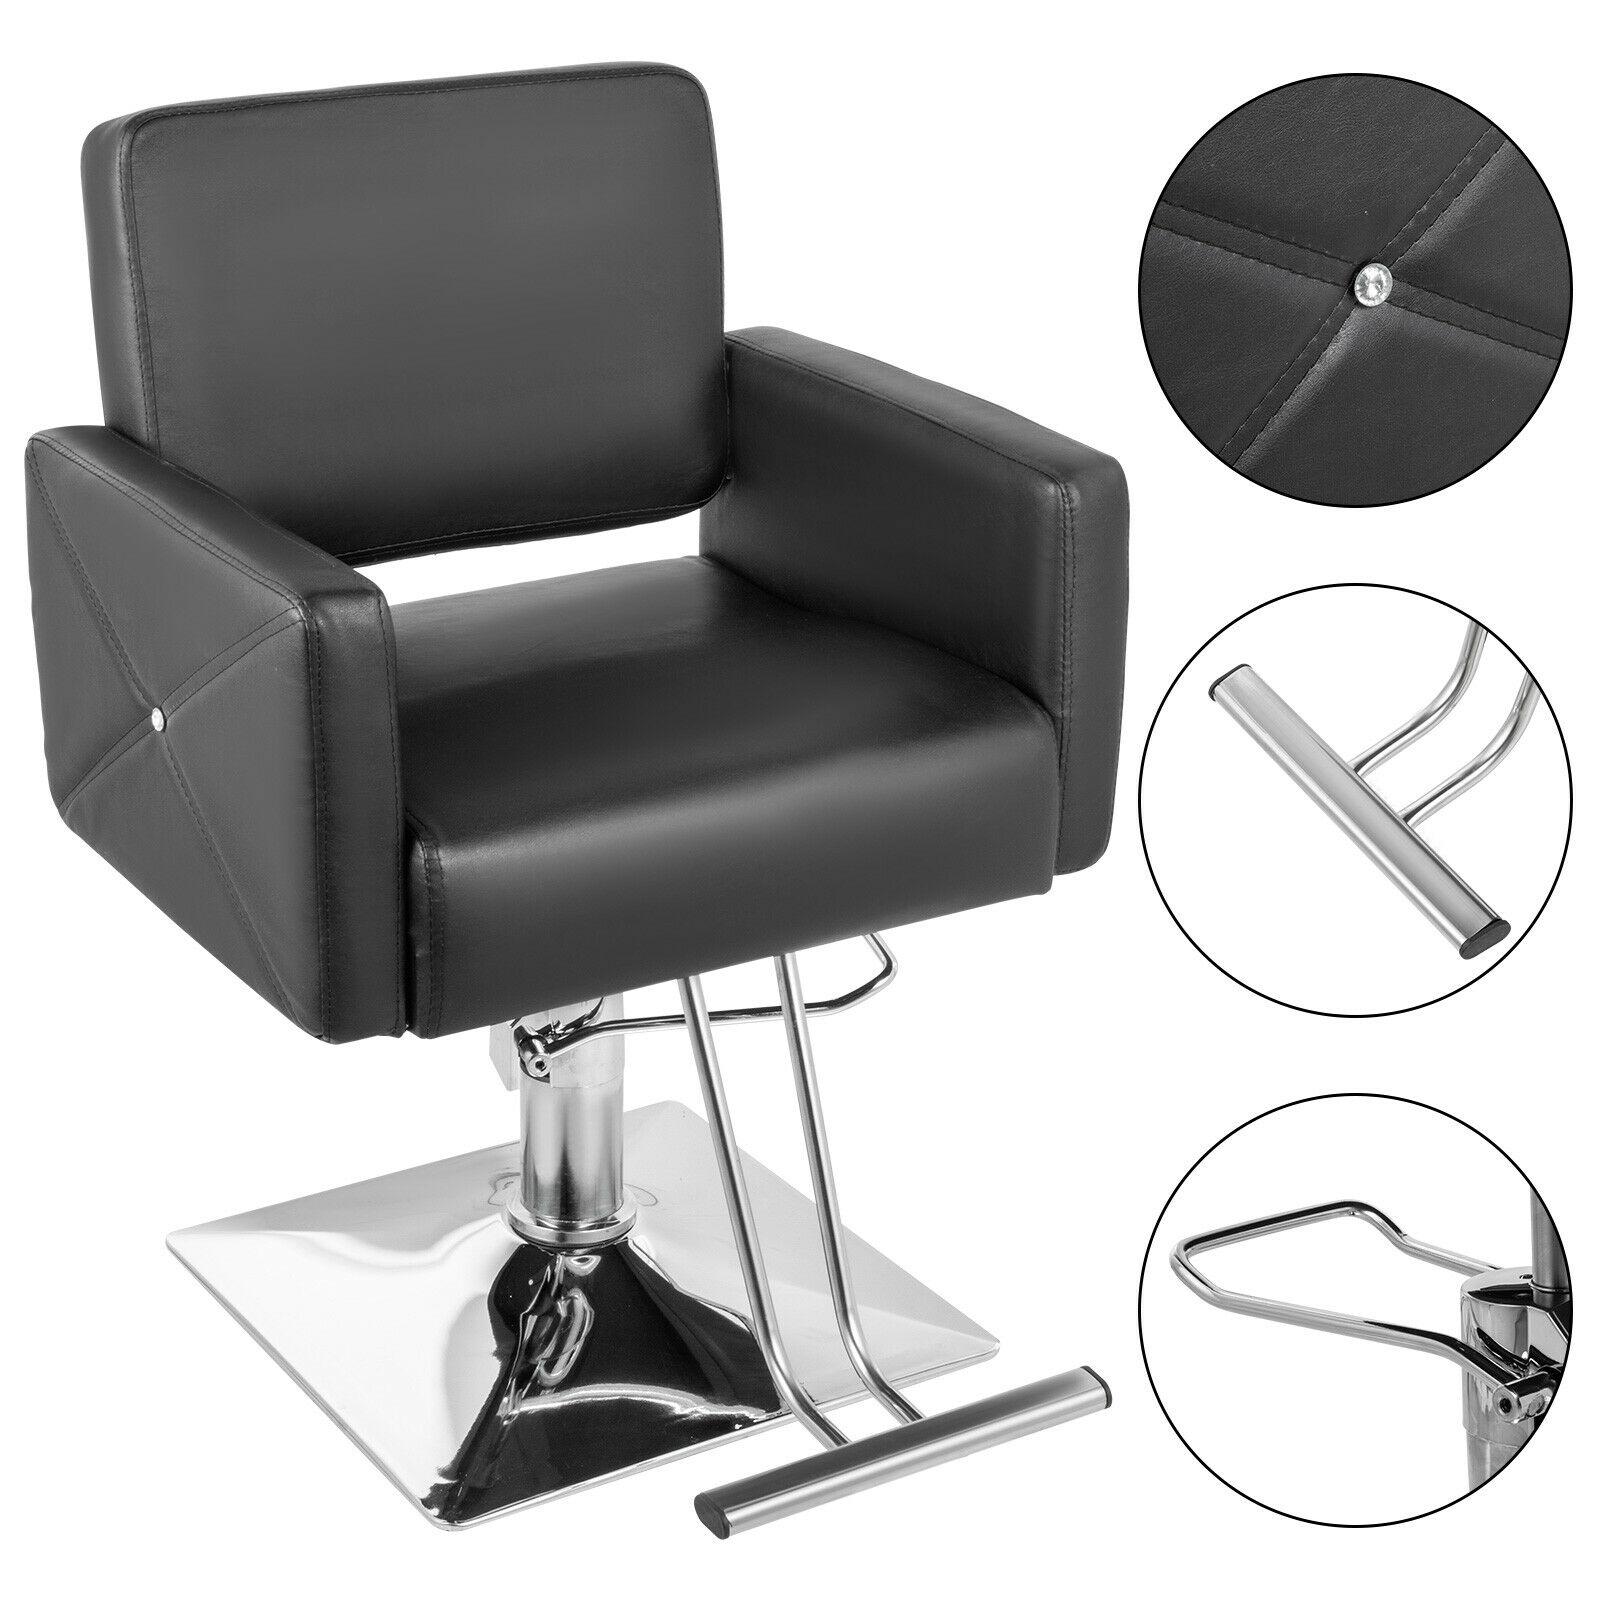 Hydraulic Barber Chair Salon Hair Styling Beauty Spa Shampoo Equipment Classic Adjustable